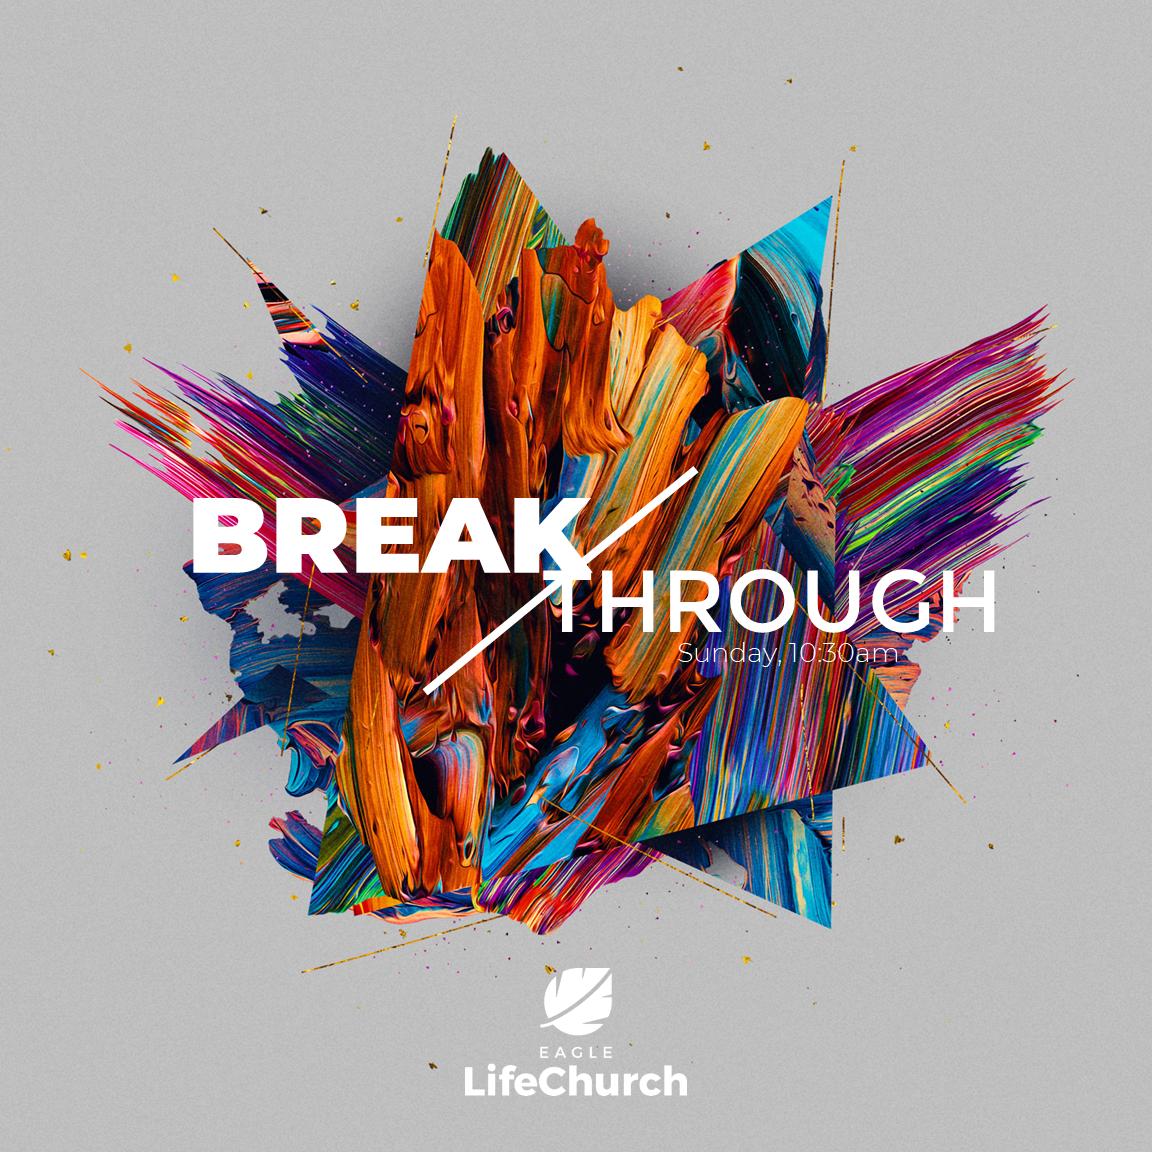 Breakthrough 2021